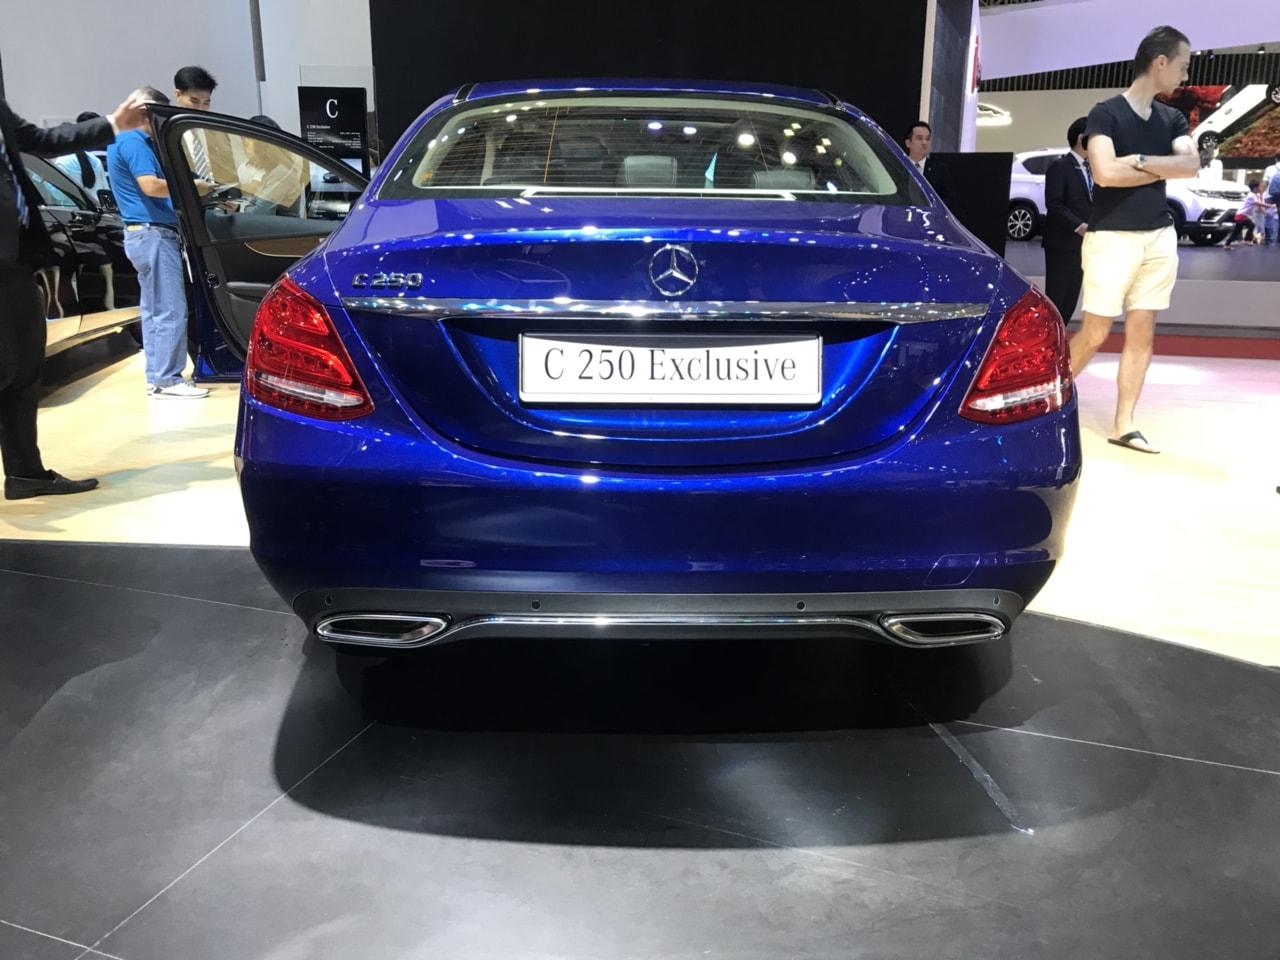 Mercedes C250 2018 2019 moi nhat (8)